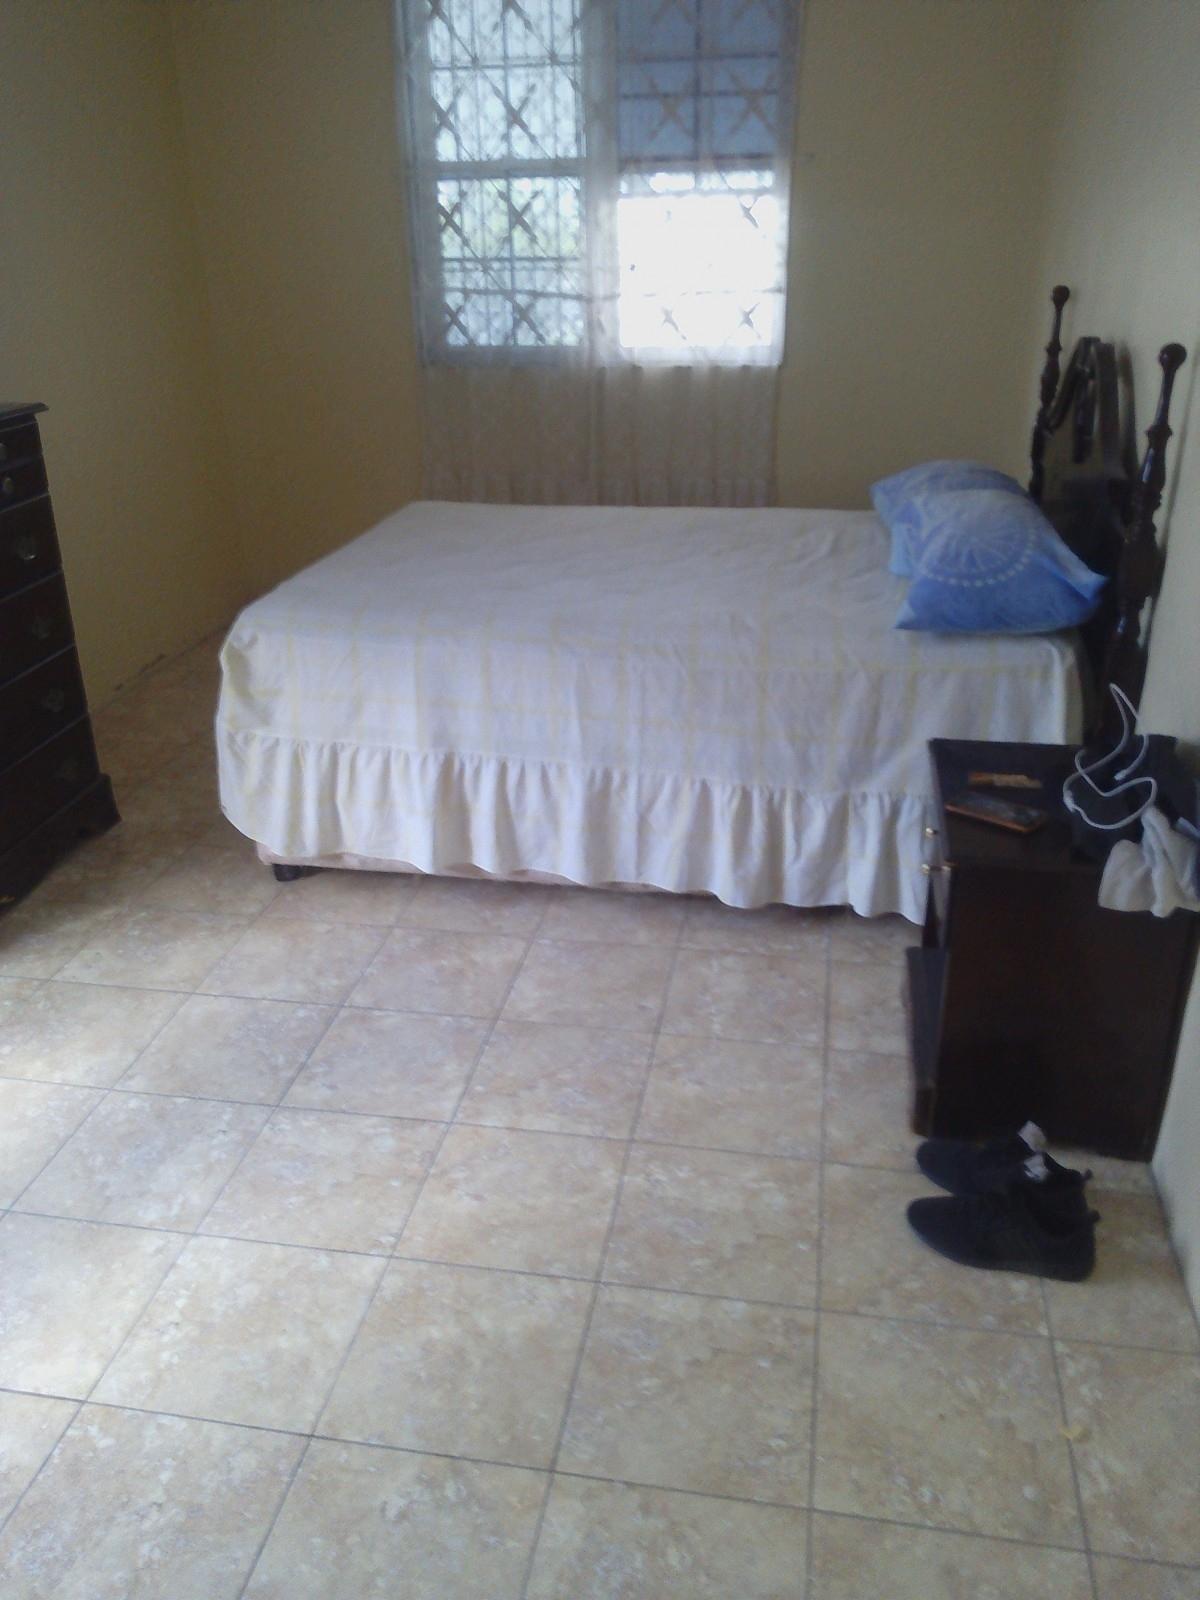 3 Bedroom 2 Bathroom House For Rent In Sydenham Villa St